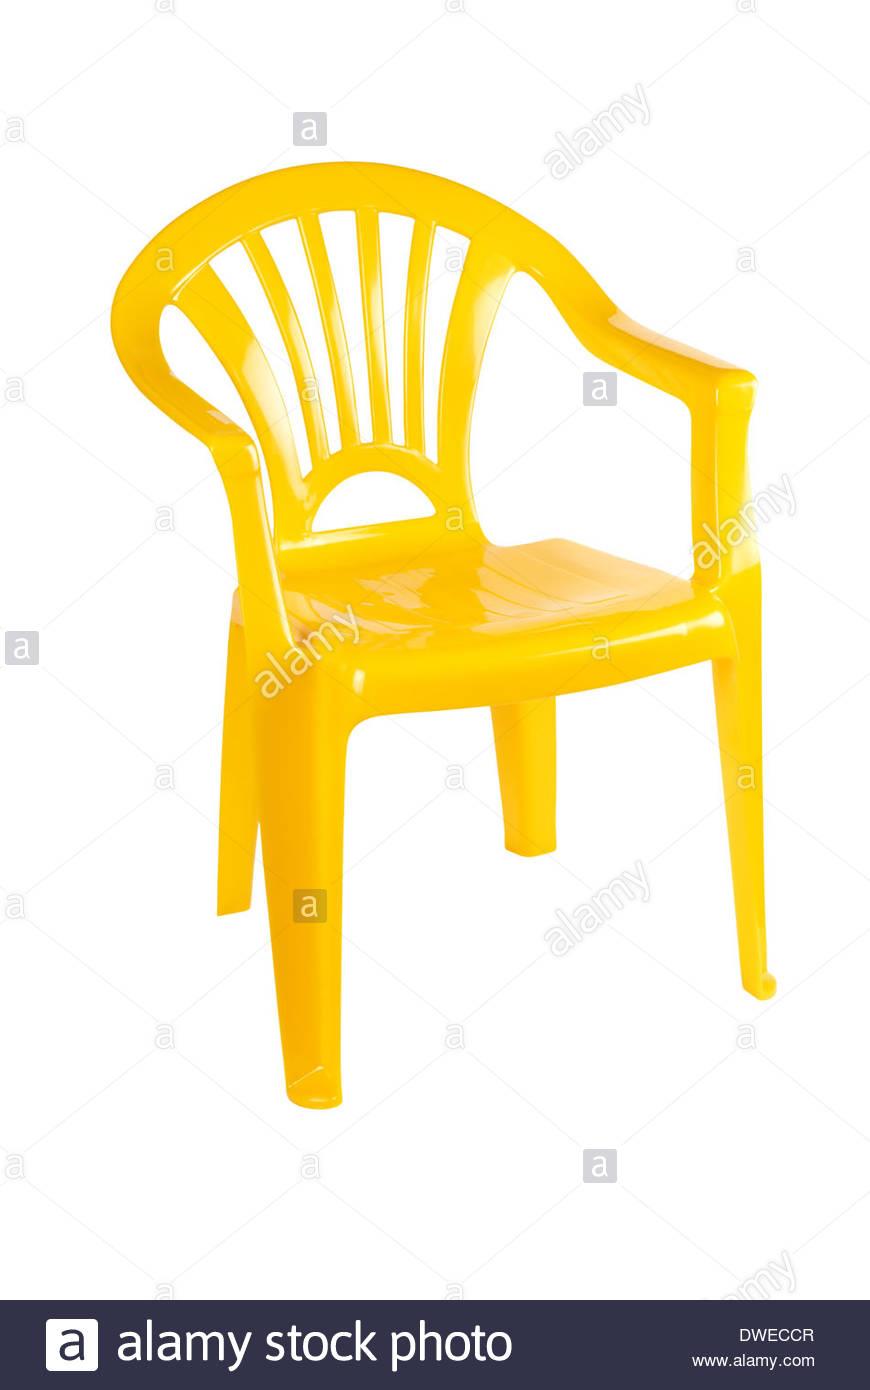 Swell Bright Yellow Plastic Patio Chair Stock Photo 67314599 Alamy Machost Co Dining Chair Design Ideas Machostcouk